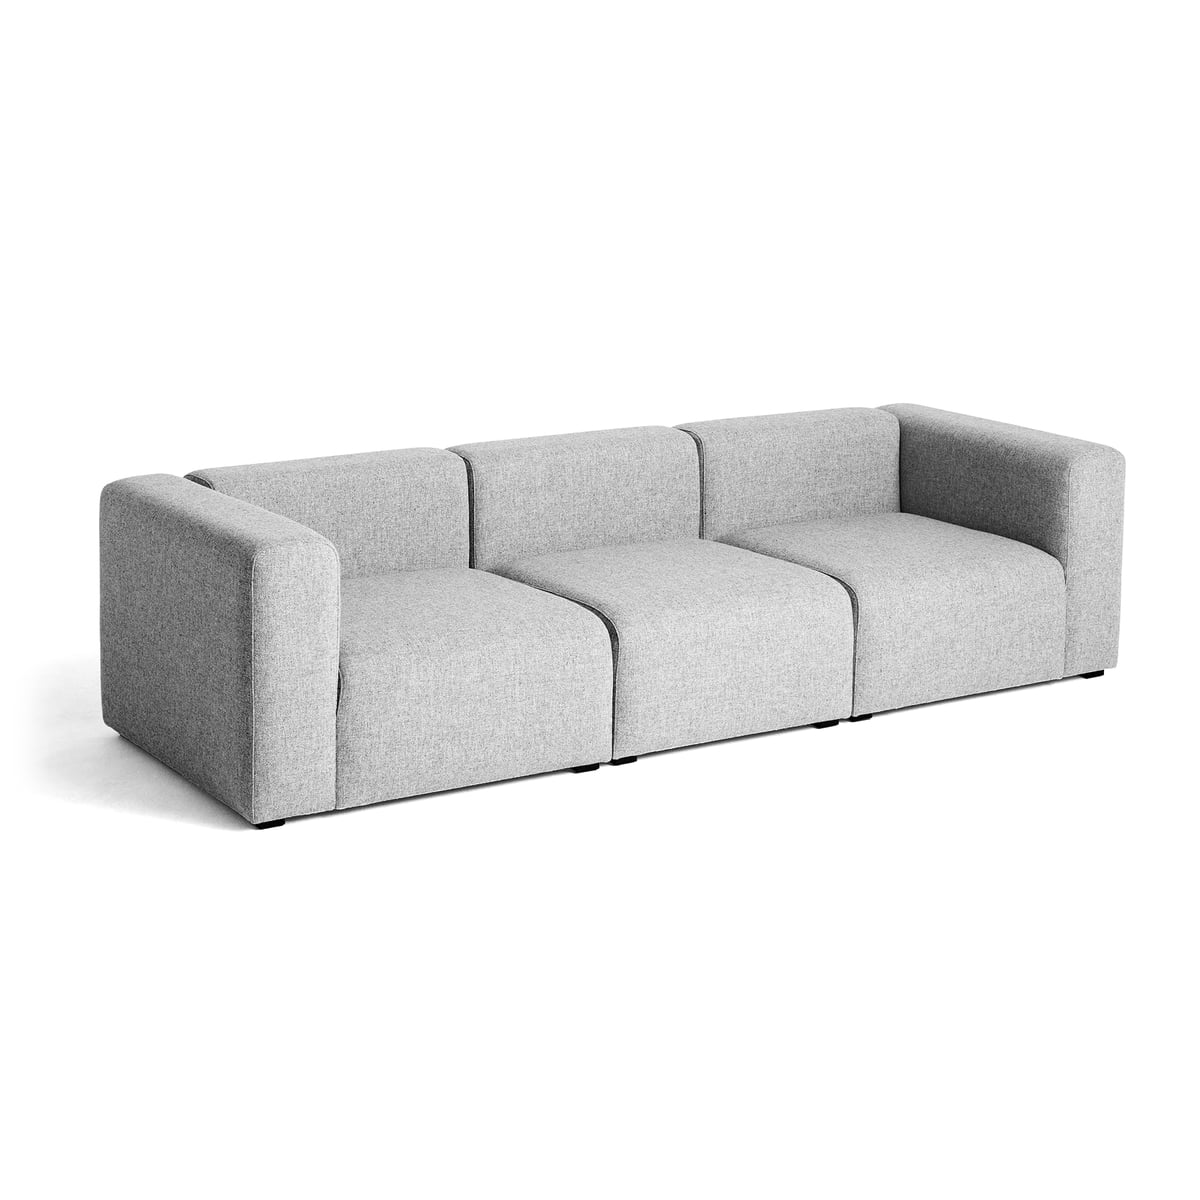 Peachy Hay Mags Sofa 3 Seater Surface 120 Light Grey Eu Cjindustries Chair Design For Home Cjindustriesco